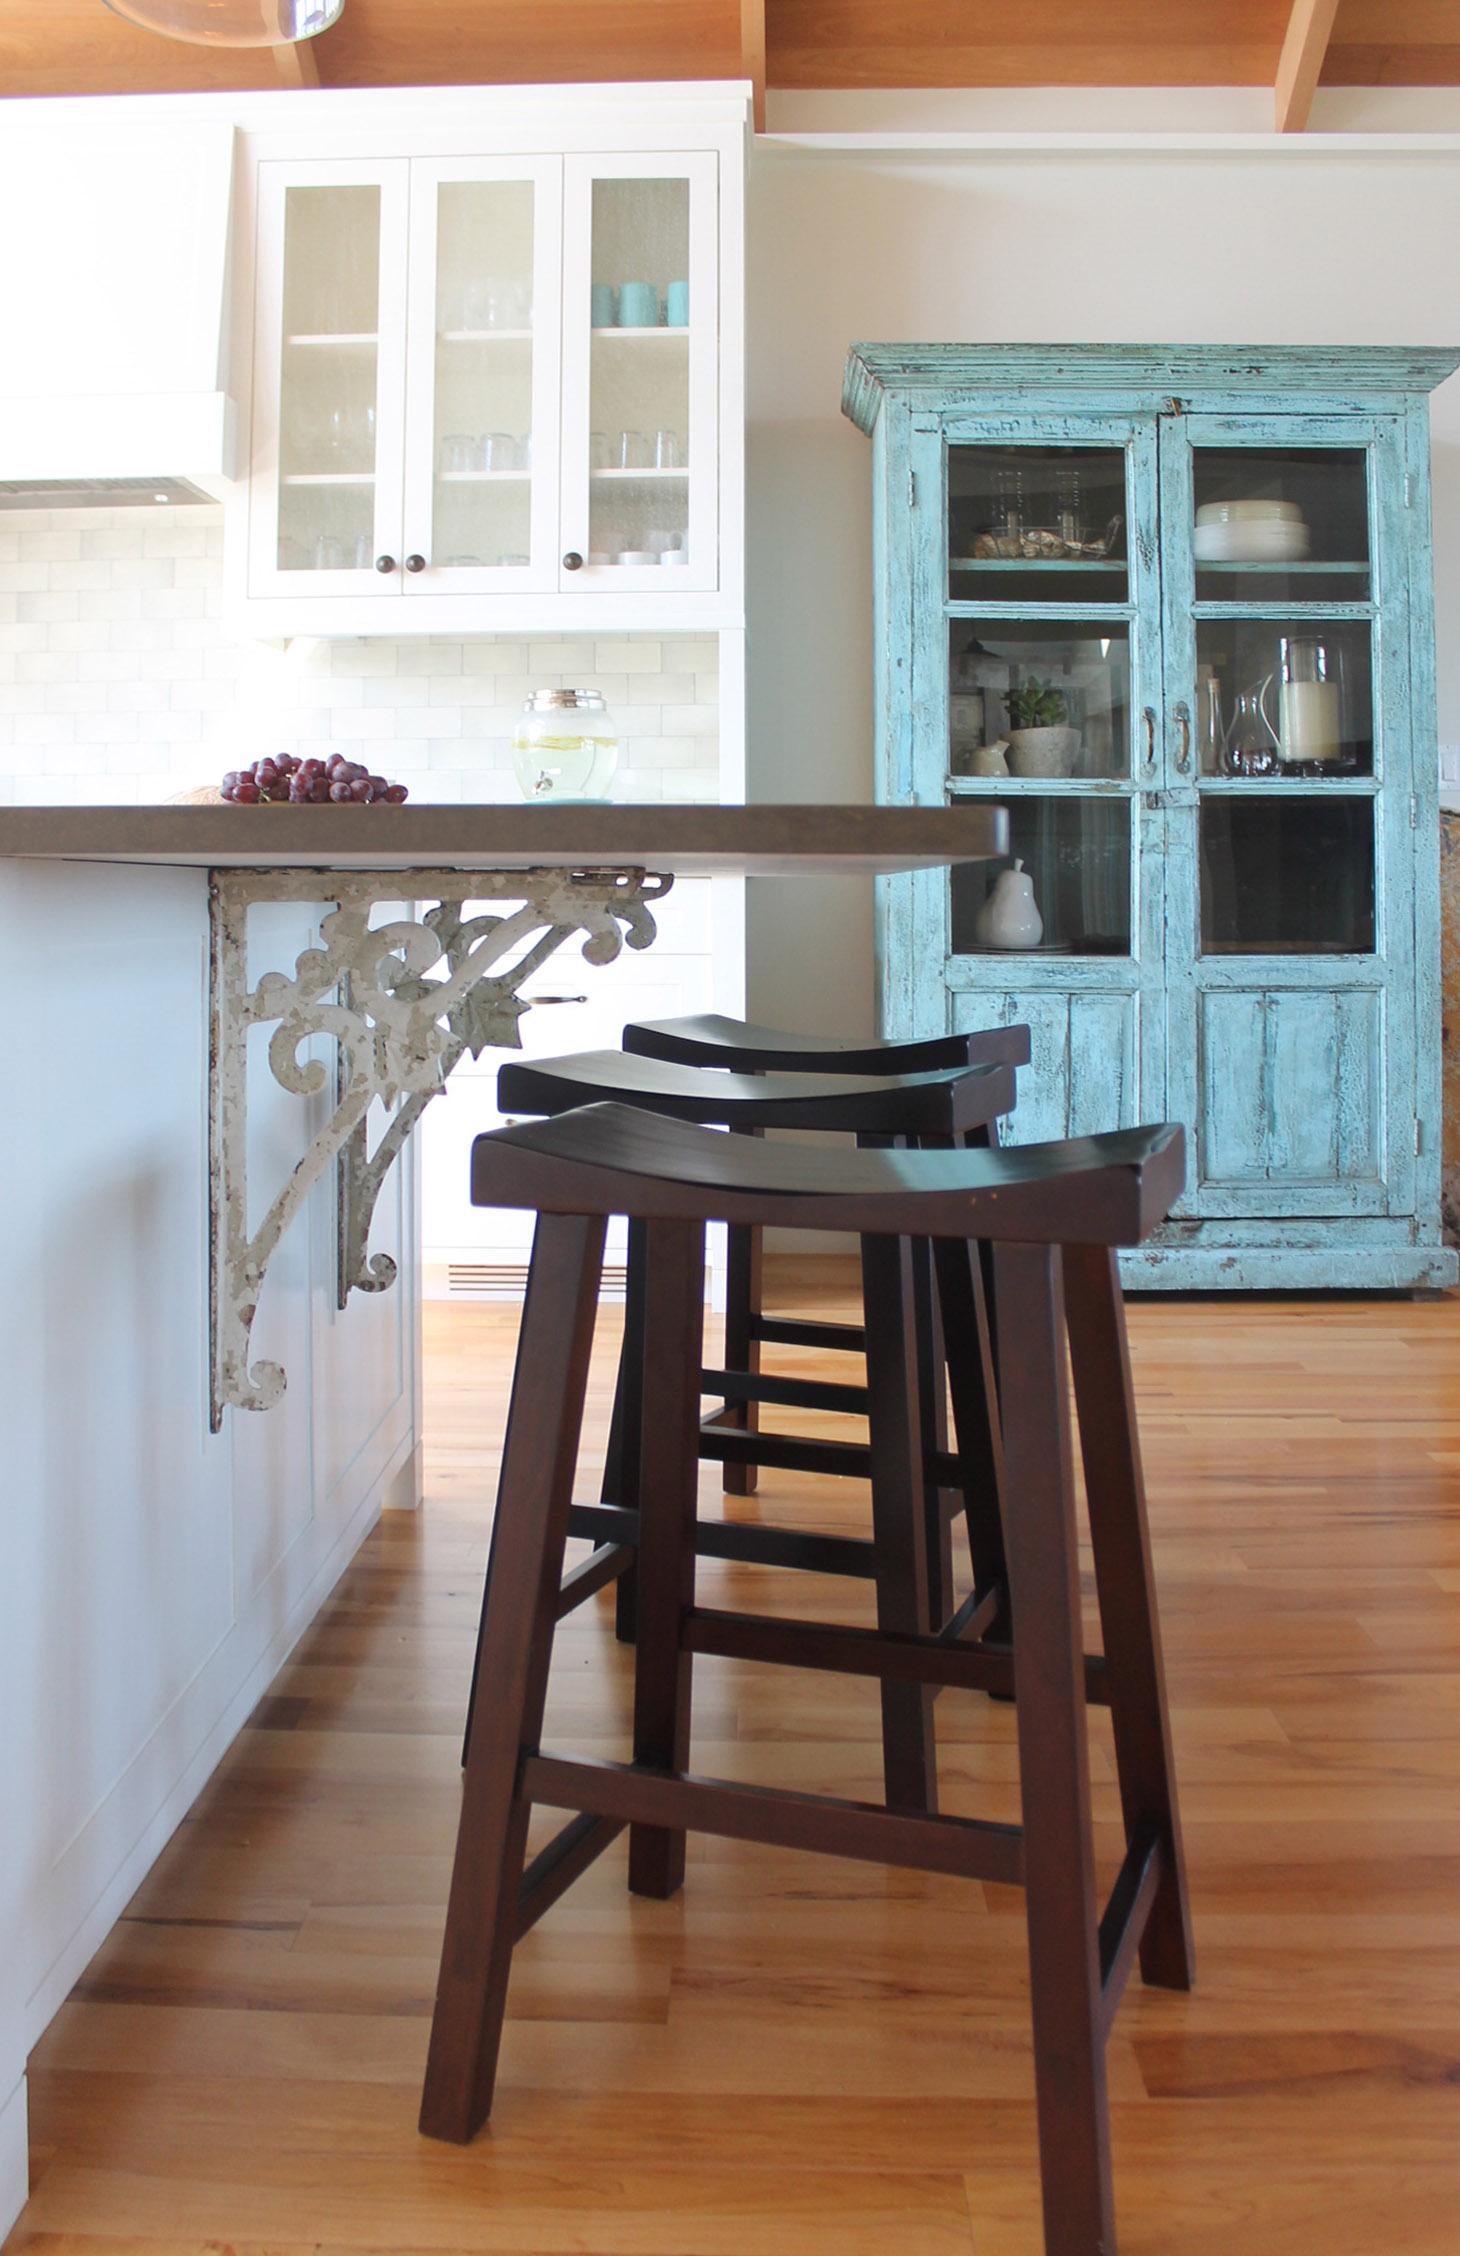 Armstrong-Kitchen Brack Detail.jpg